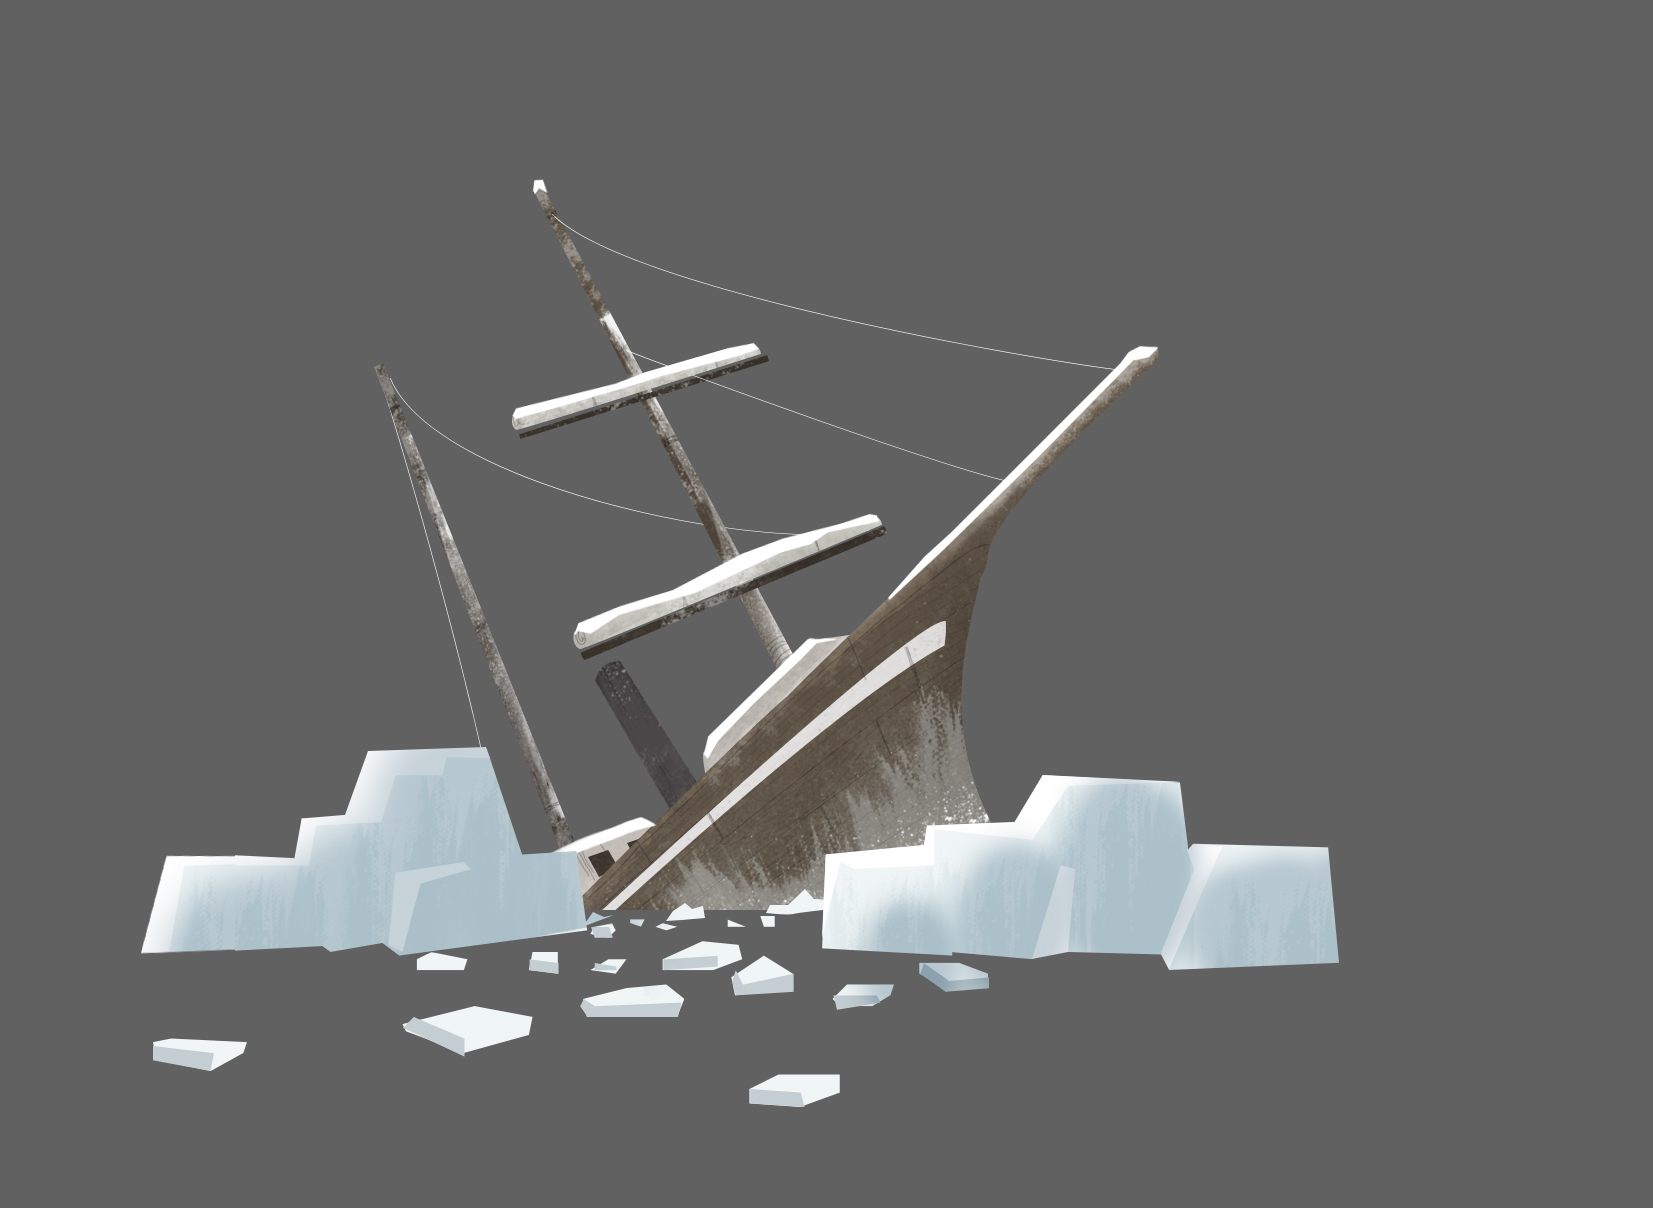 boat-04.jpg